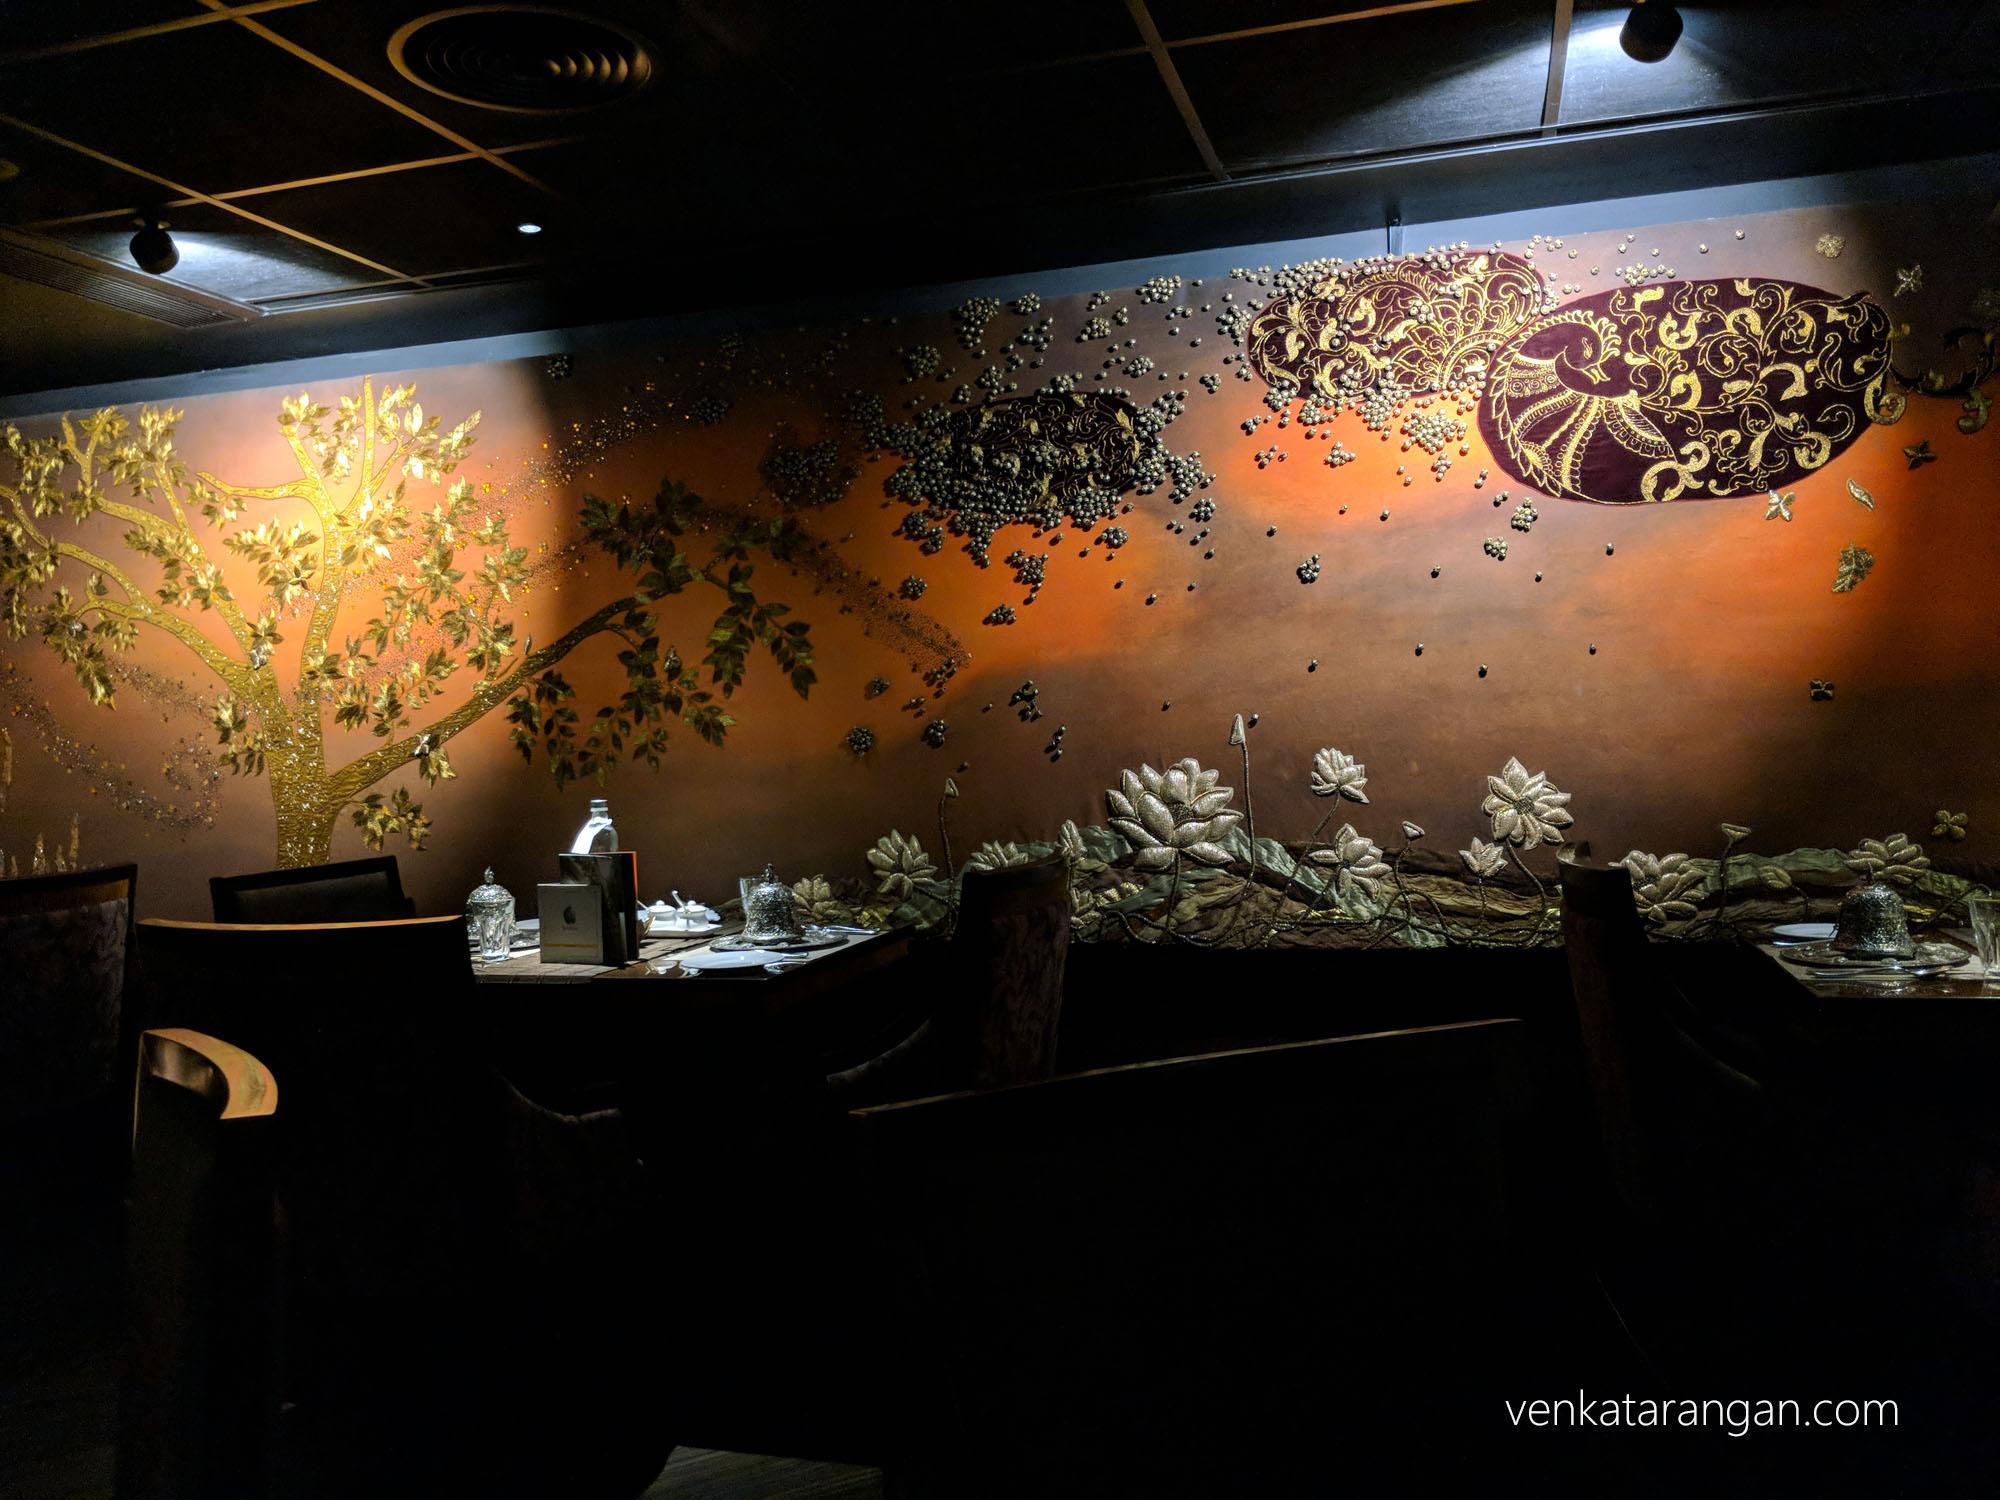 Hamsa Restaurant, Adyar - Nice interiors